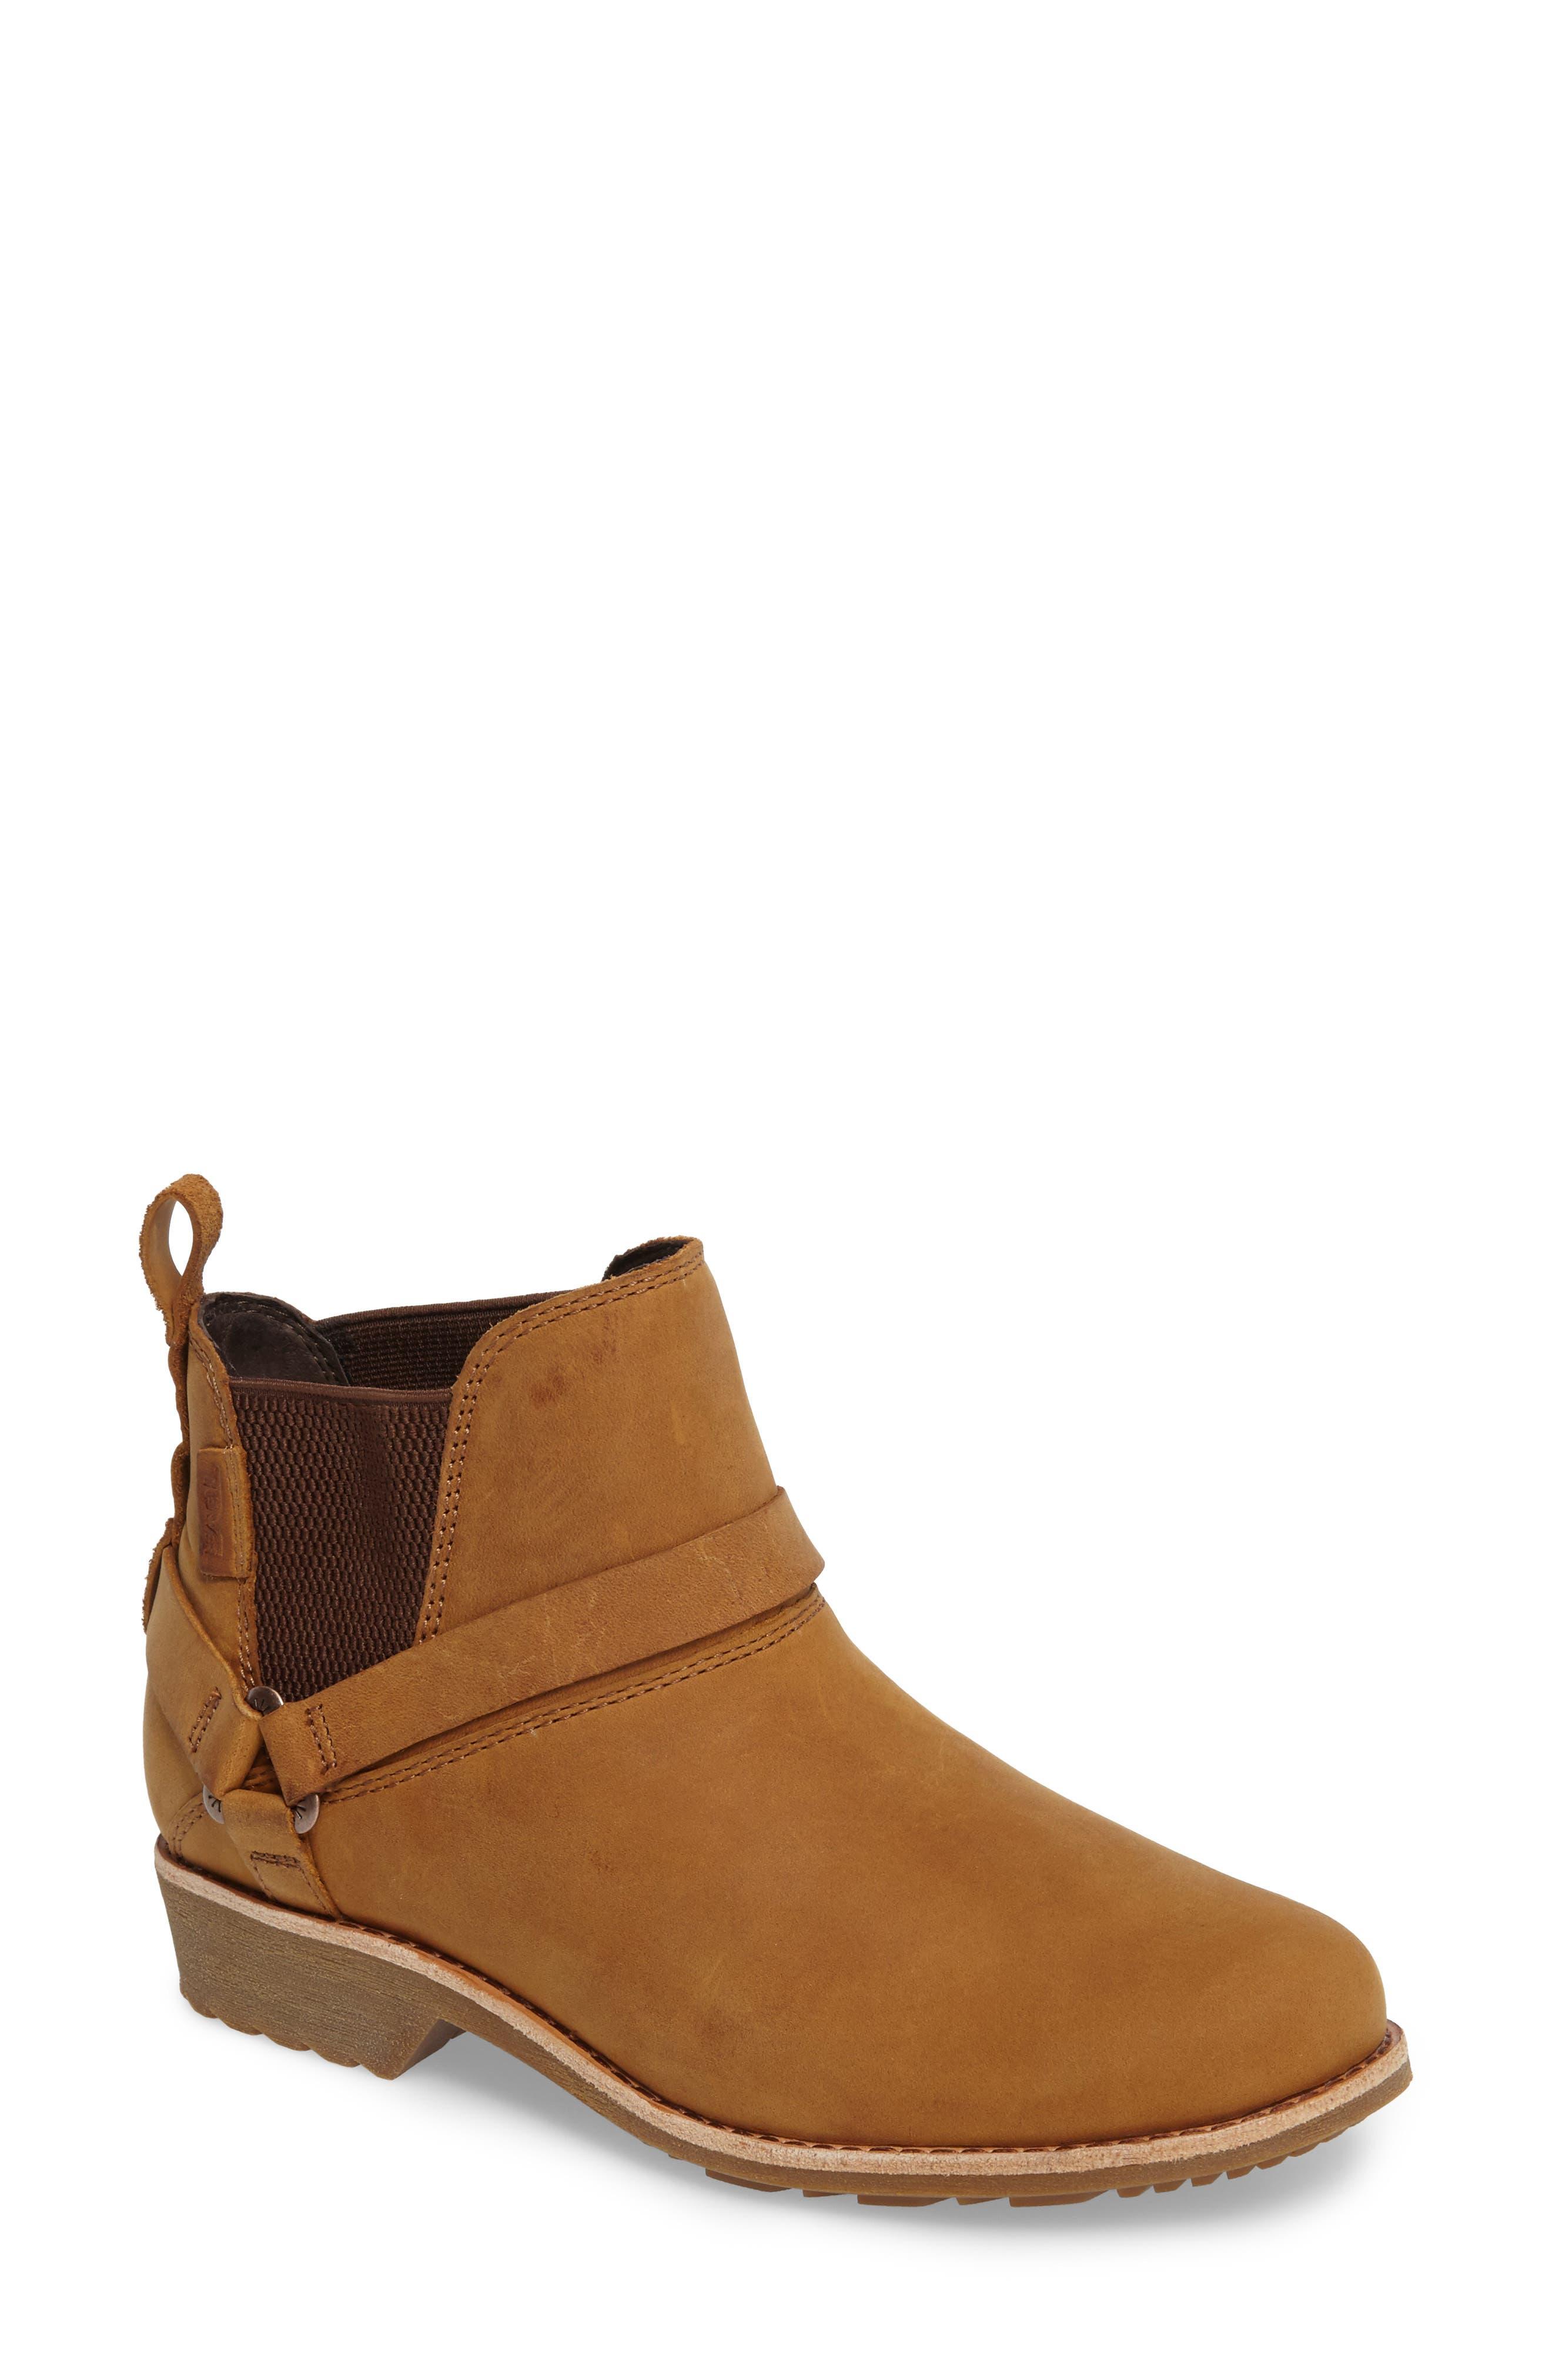 Alternate Image 1 Selected - Teva Dina La Vina Dos Waterproof Chelsea Boot (Women)